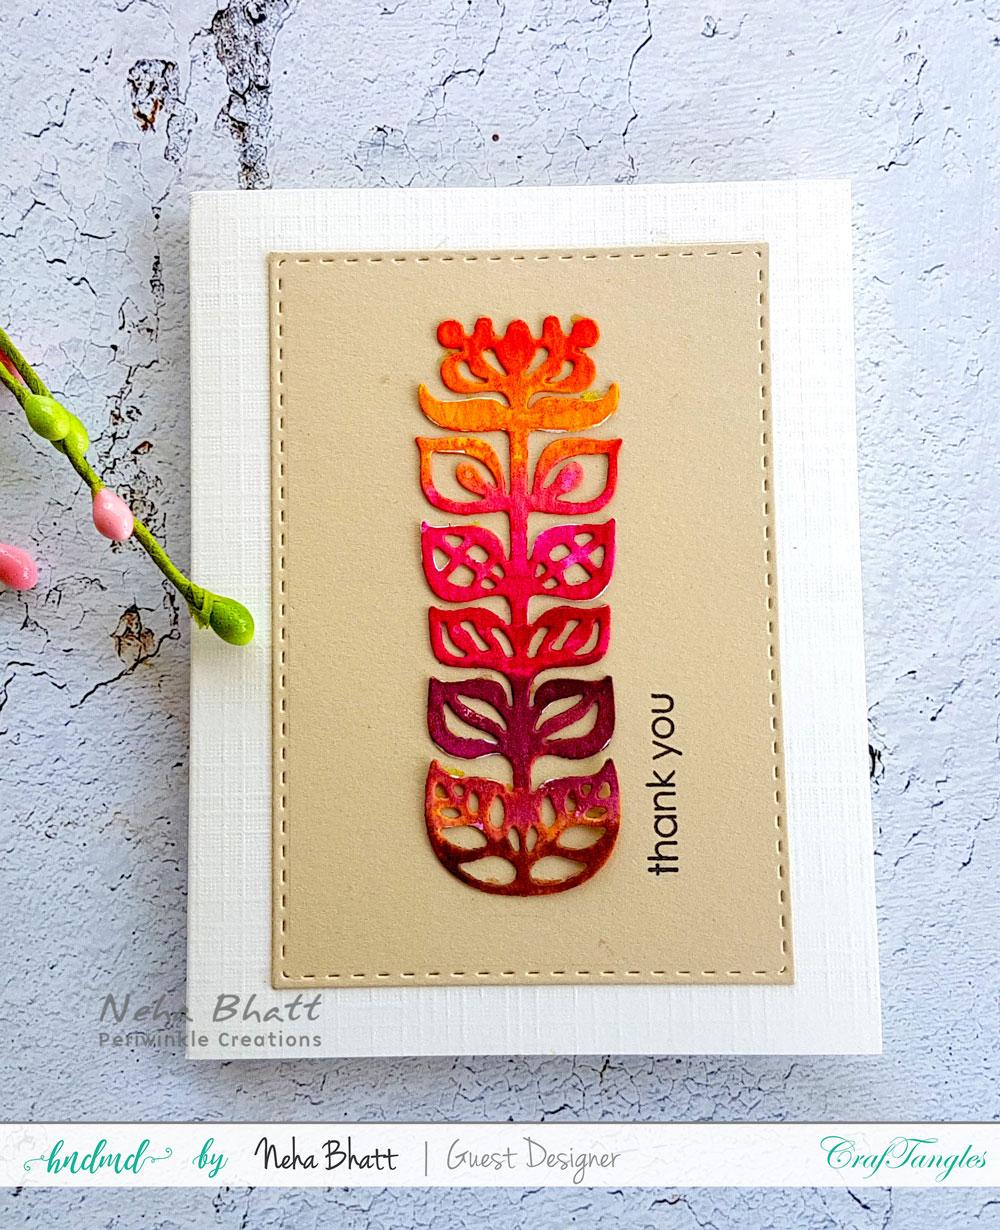 Fun watercolor inspirations by Neha Bhatt using CrafTangles liquid watercolors 9